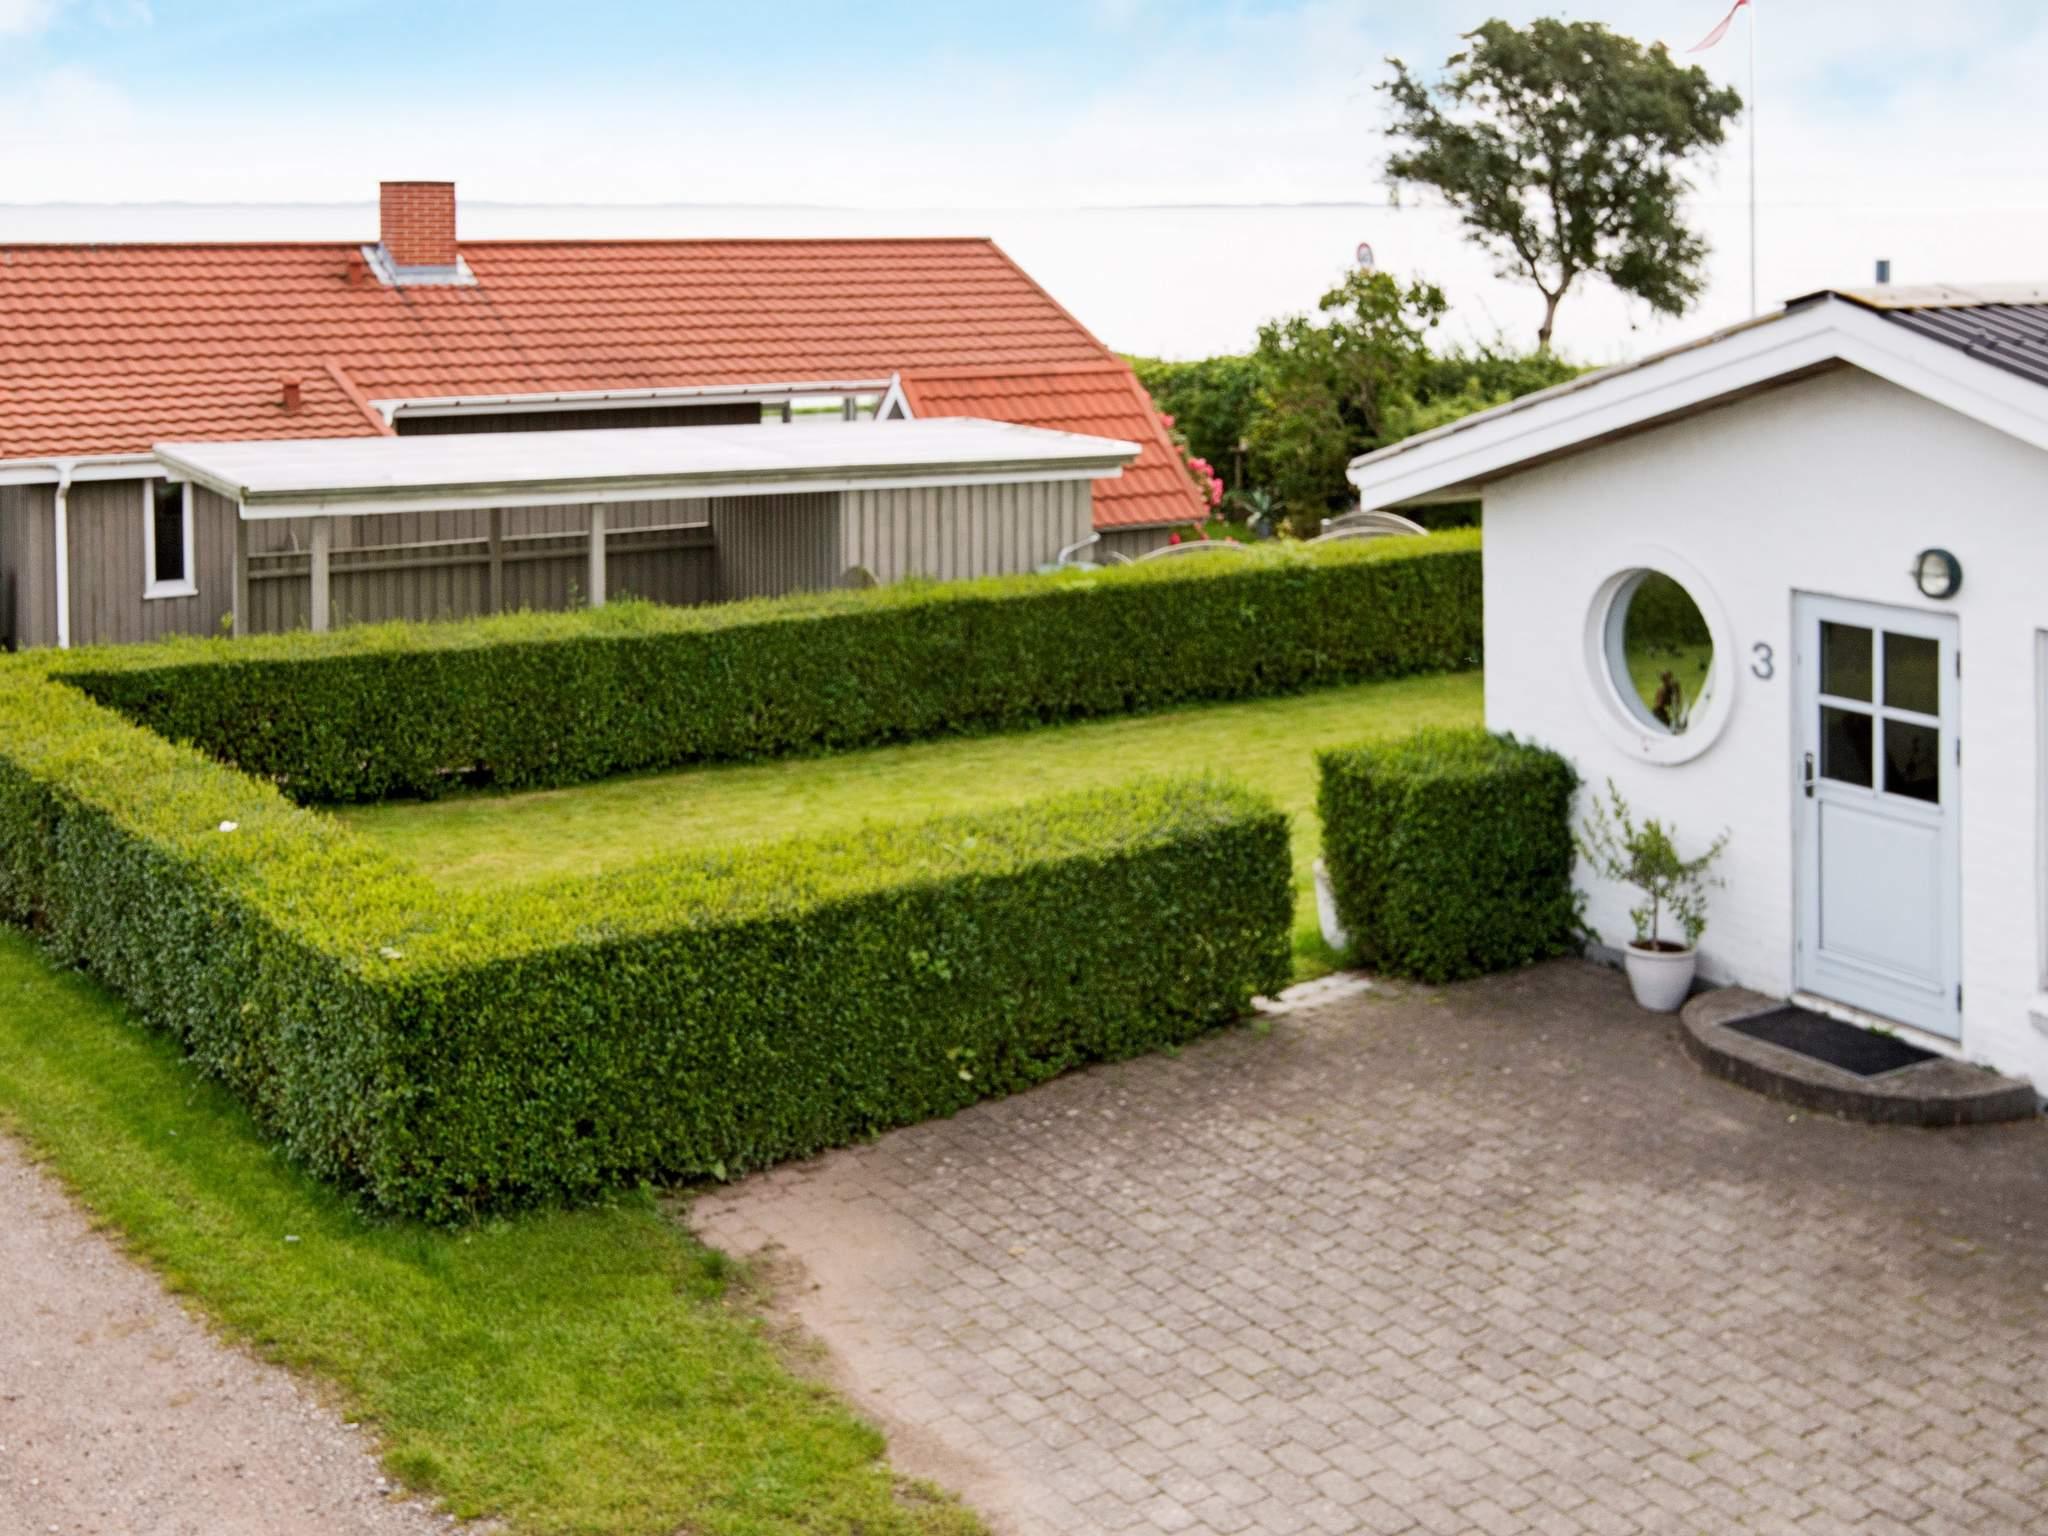 Ferienhaus Ajstrup Strand/Malling (2355032), Ajstrup, , Dänische Ostsee, Dänemark, Bild 13